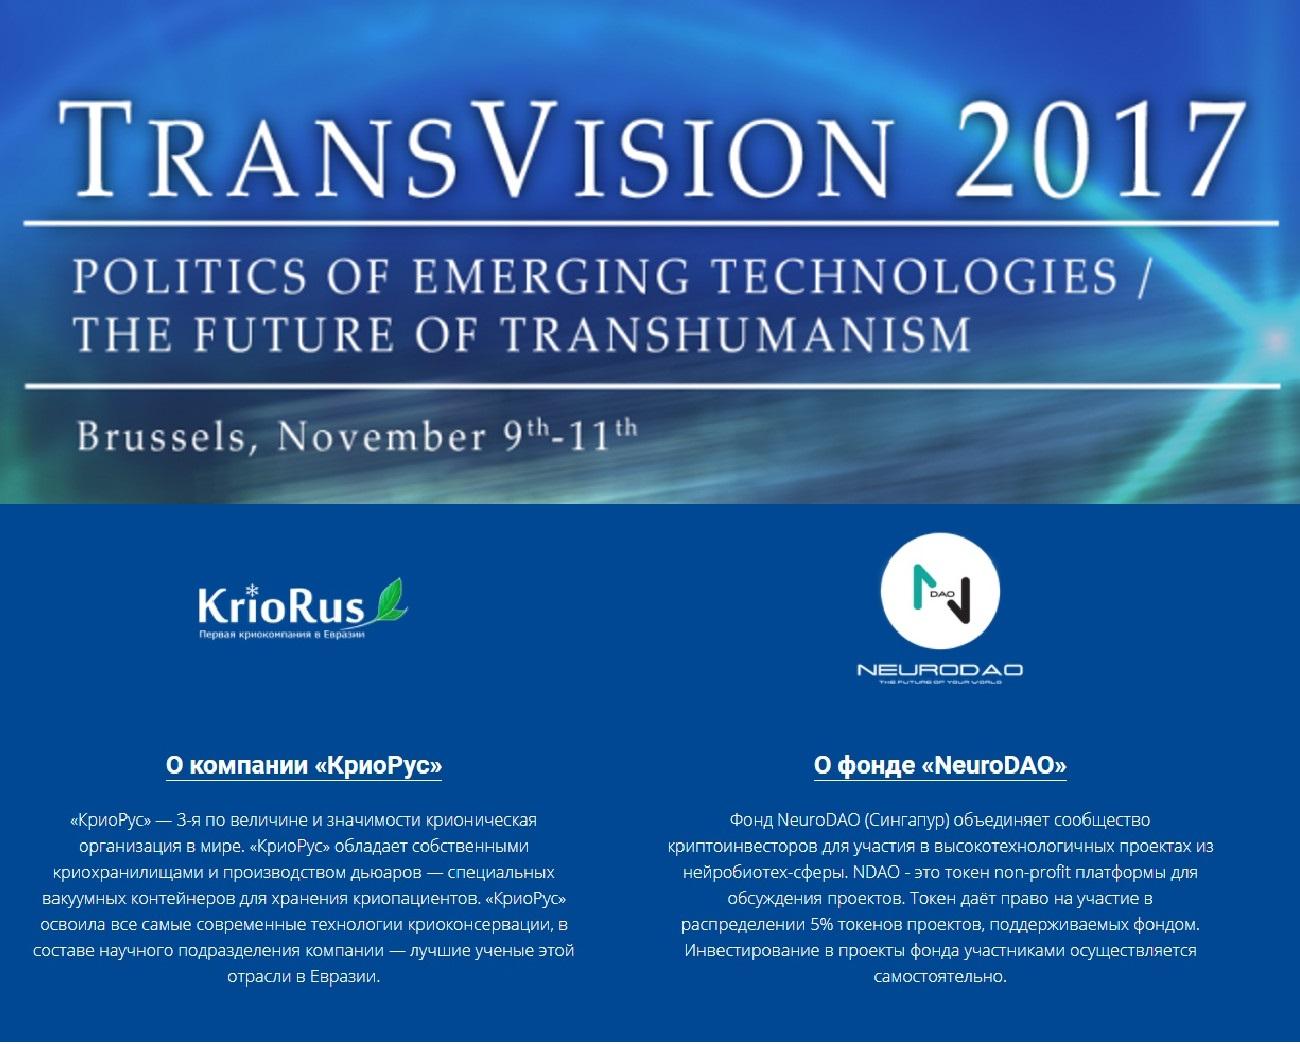 ICO-Cryogen-KrioRus-Transvision-2017-Brussels.jpg